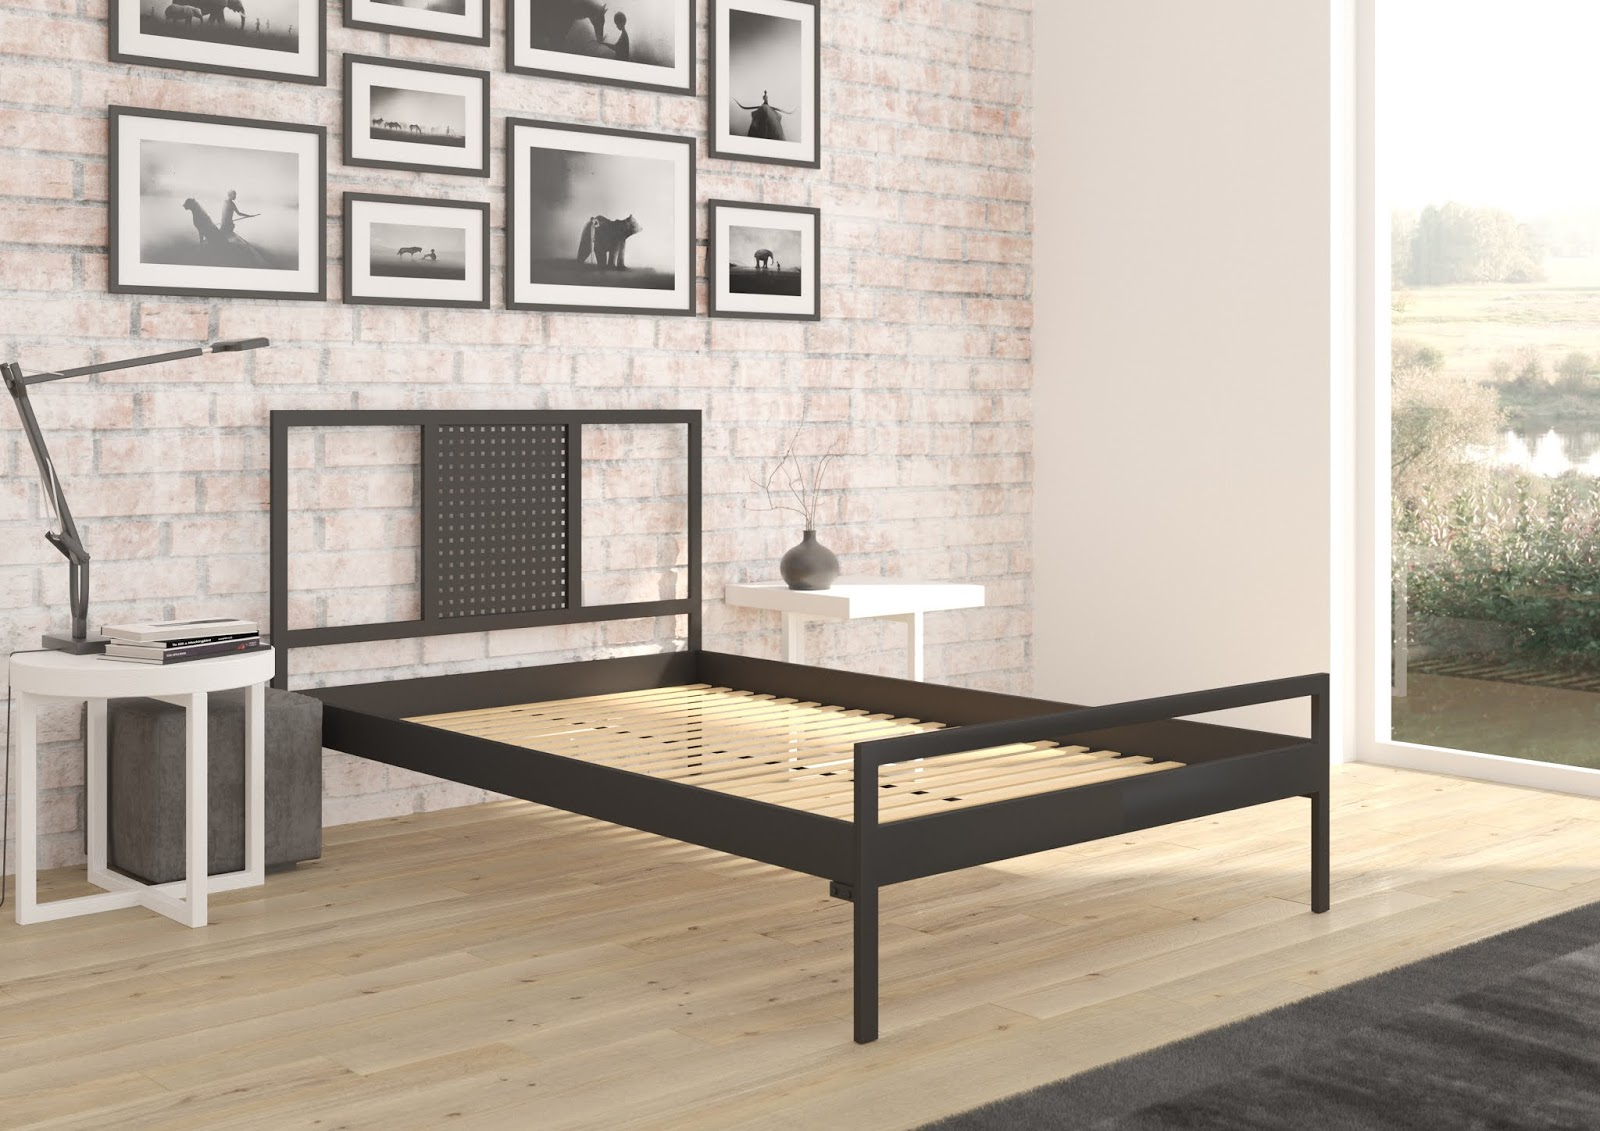 Łóżko metalowe wzór 41